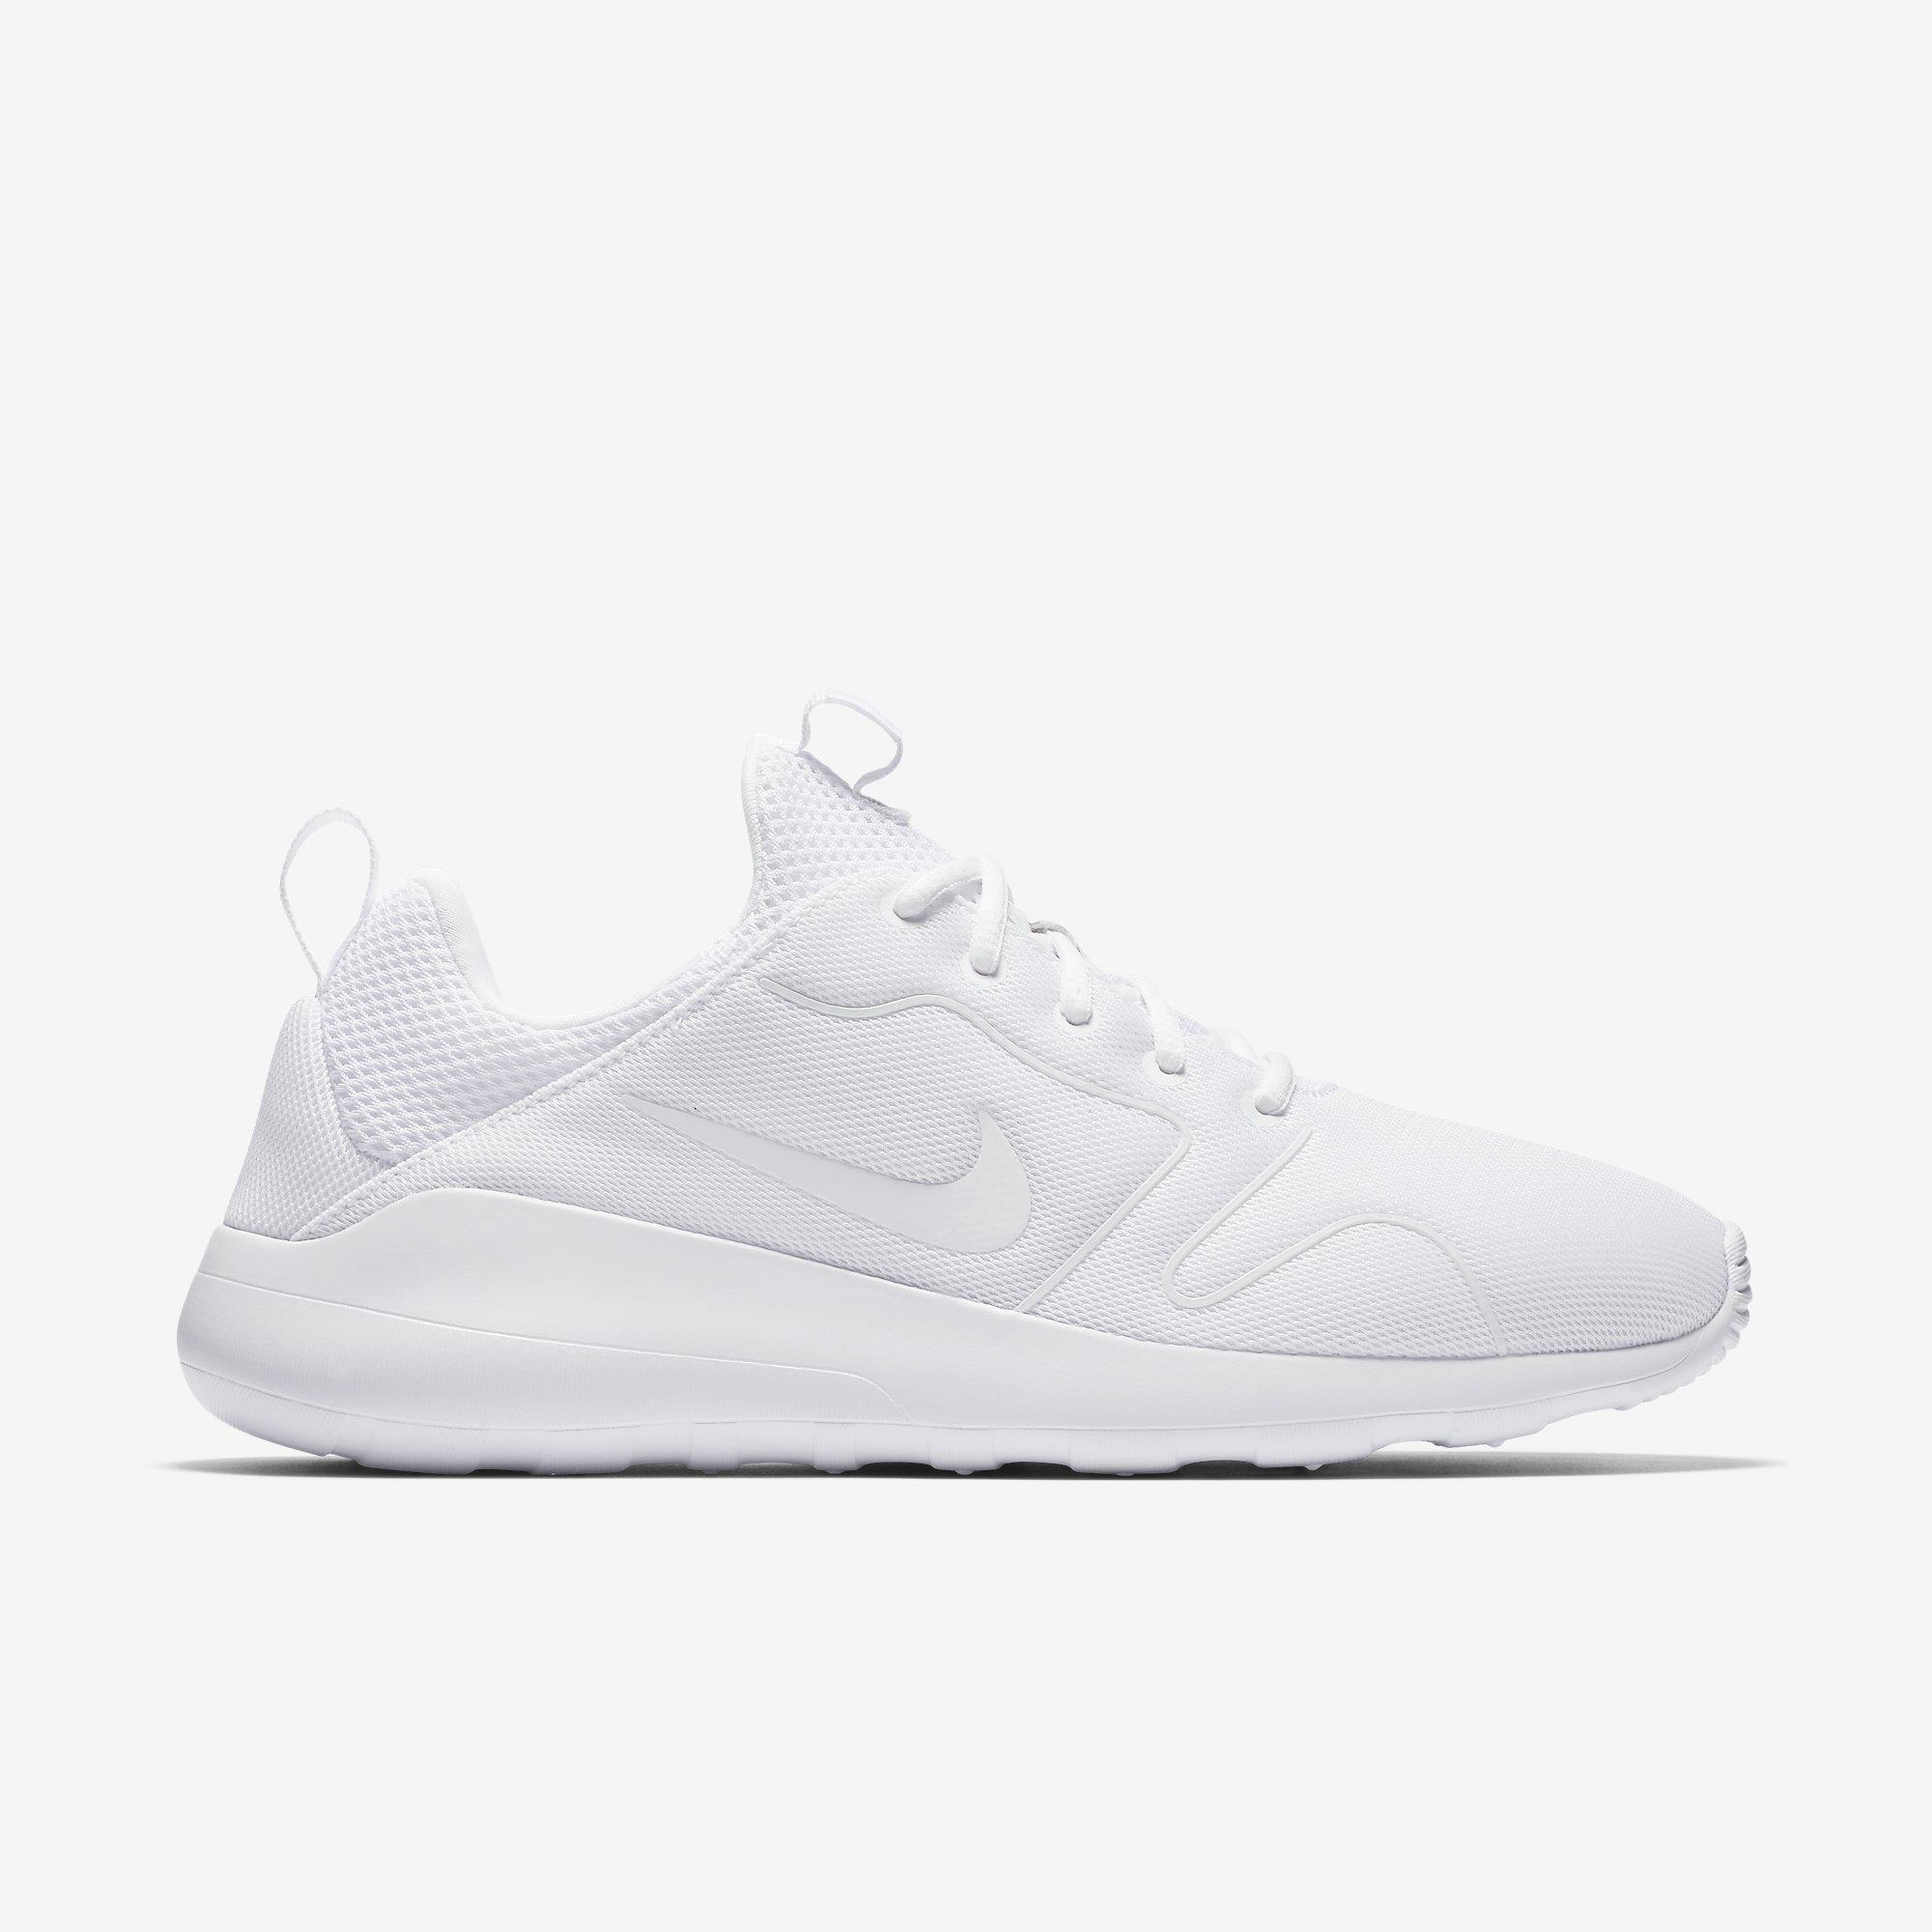 Nike Mens Kaishi 2.0 Running Shoes - White - Tennisnuts.com